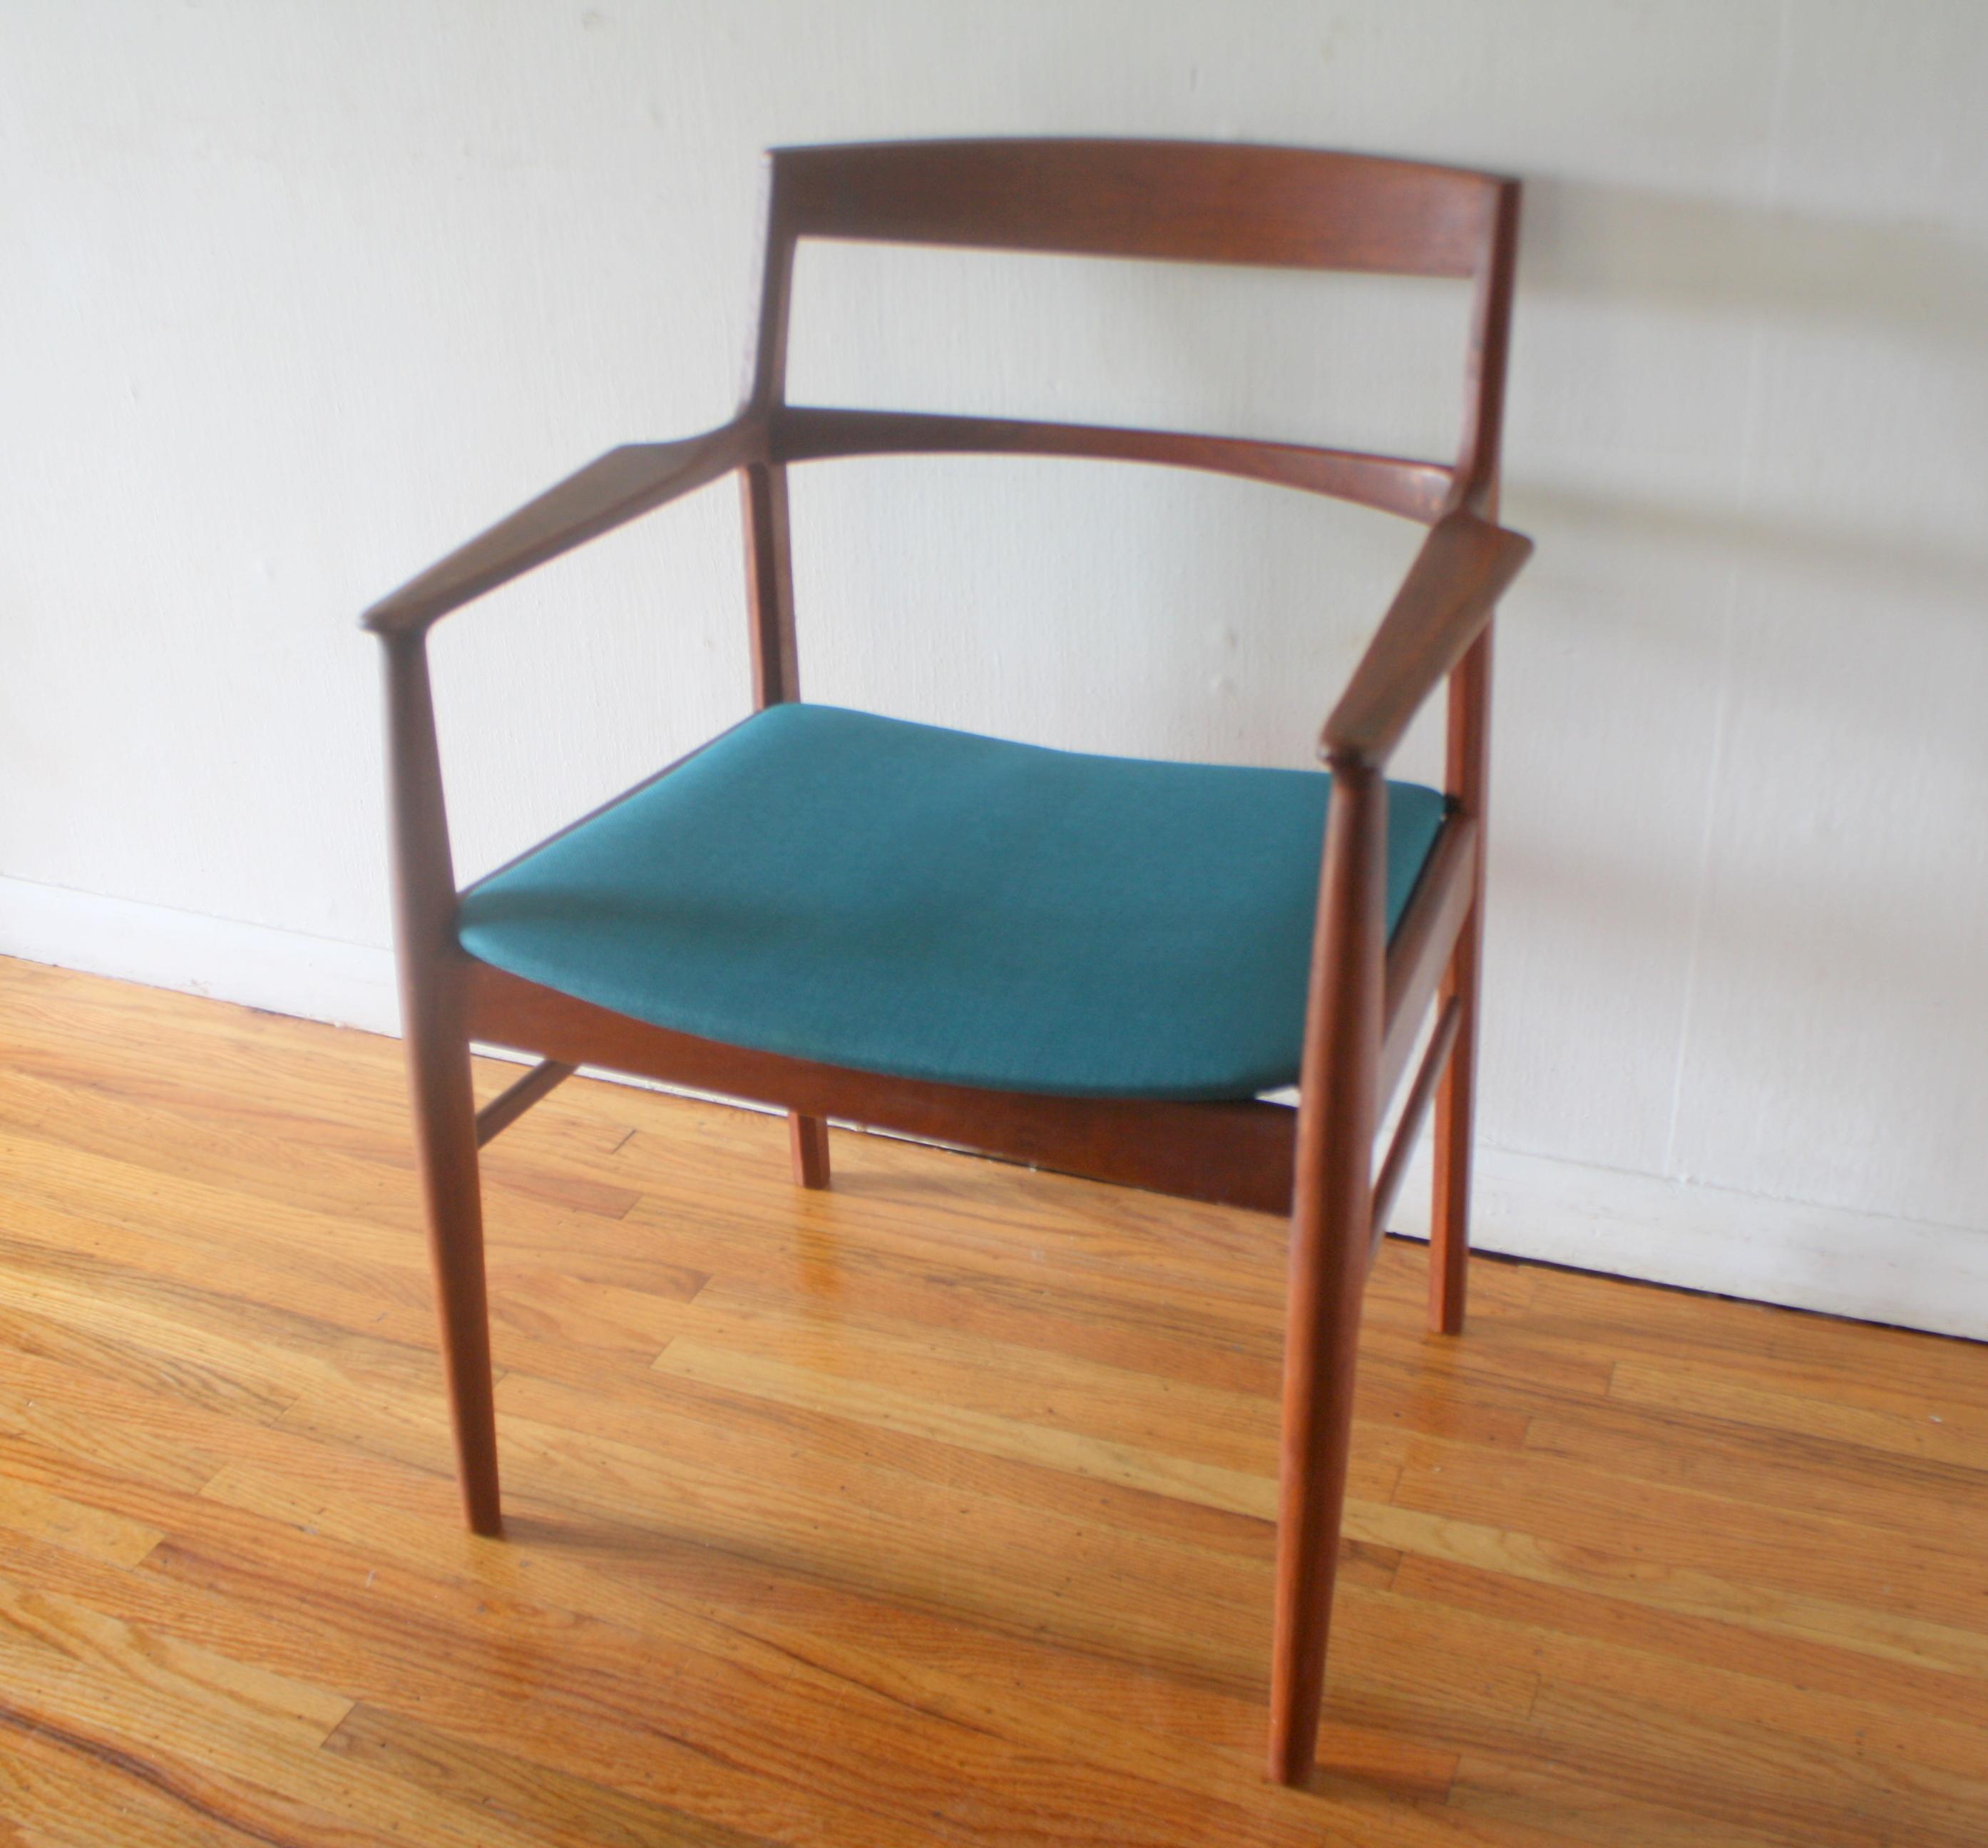 Danish teak chair with teal seat 1